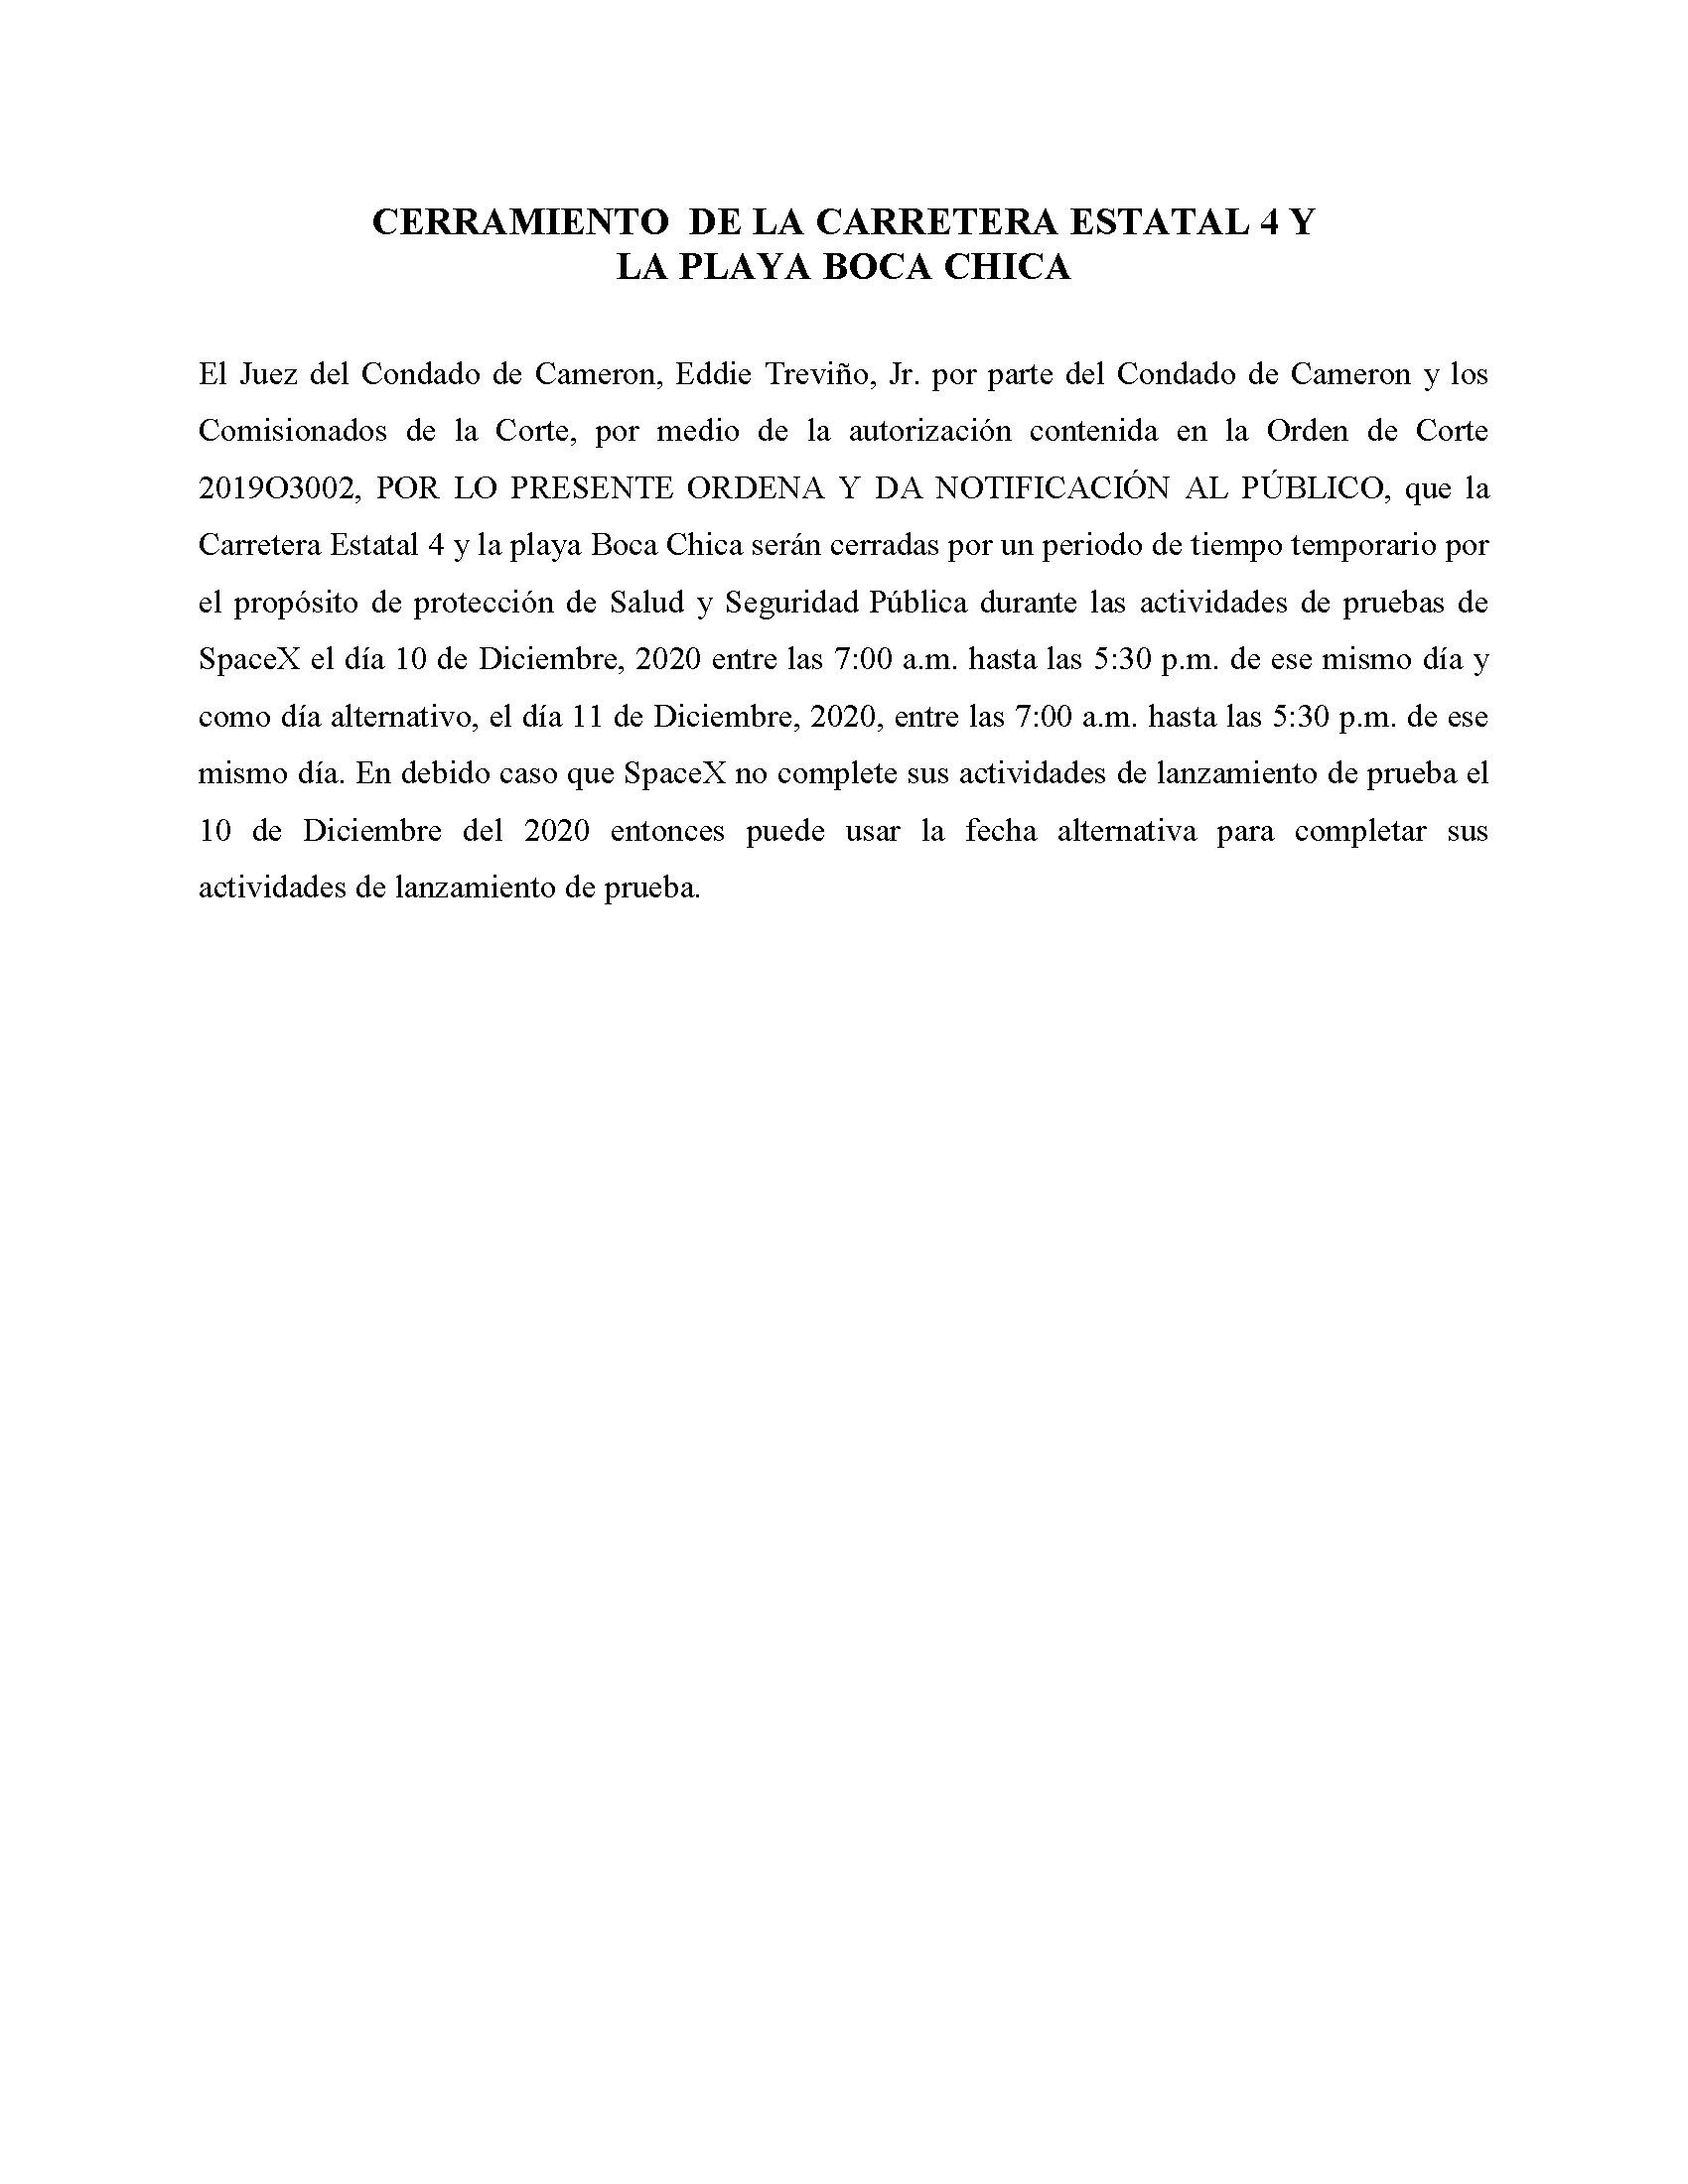 ORDER.CLOSURE OF HIGHWAY 4 Y LA PLAYA BOCA CHICA.SPANISH.12.10.2020